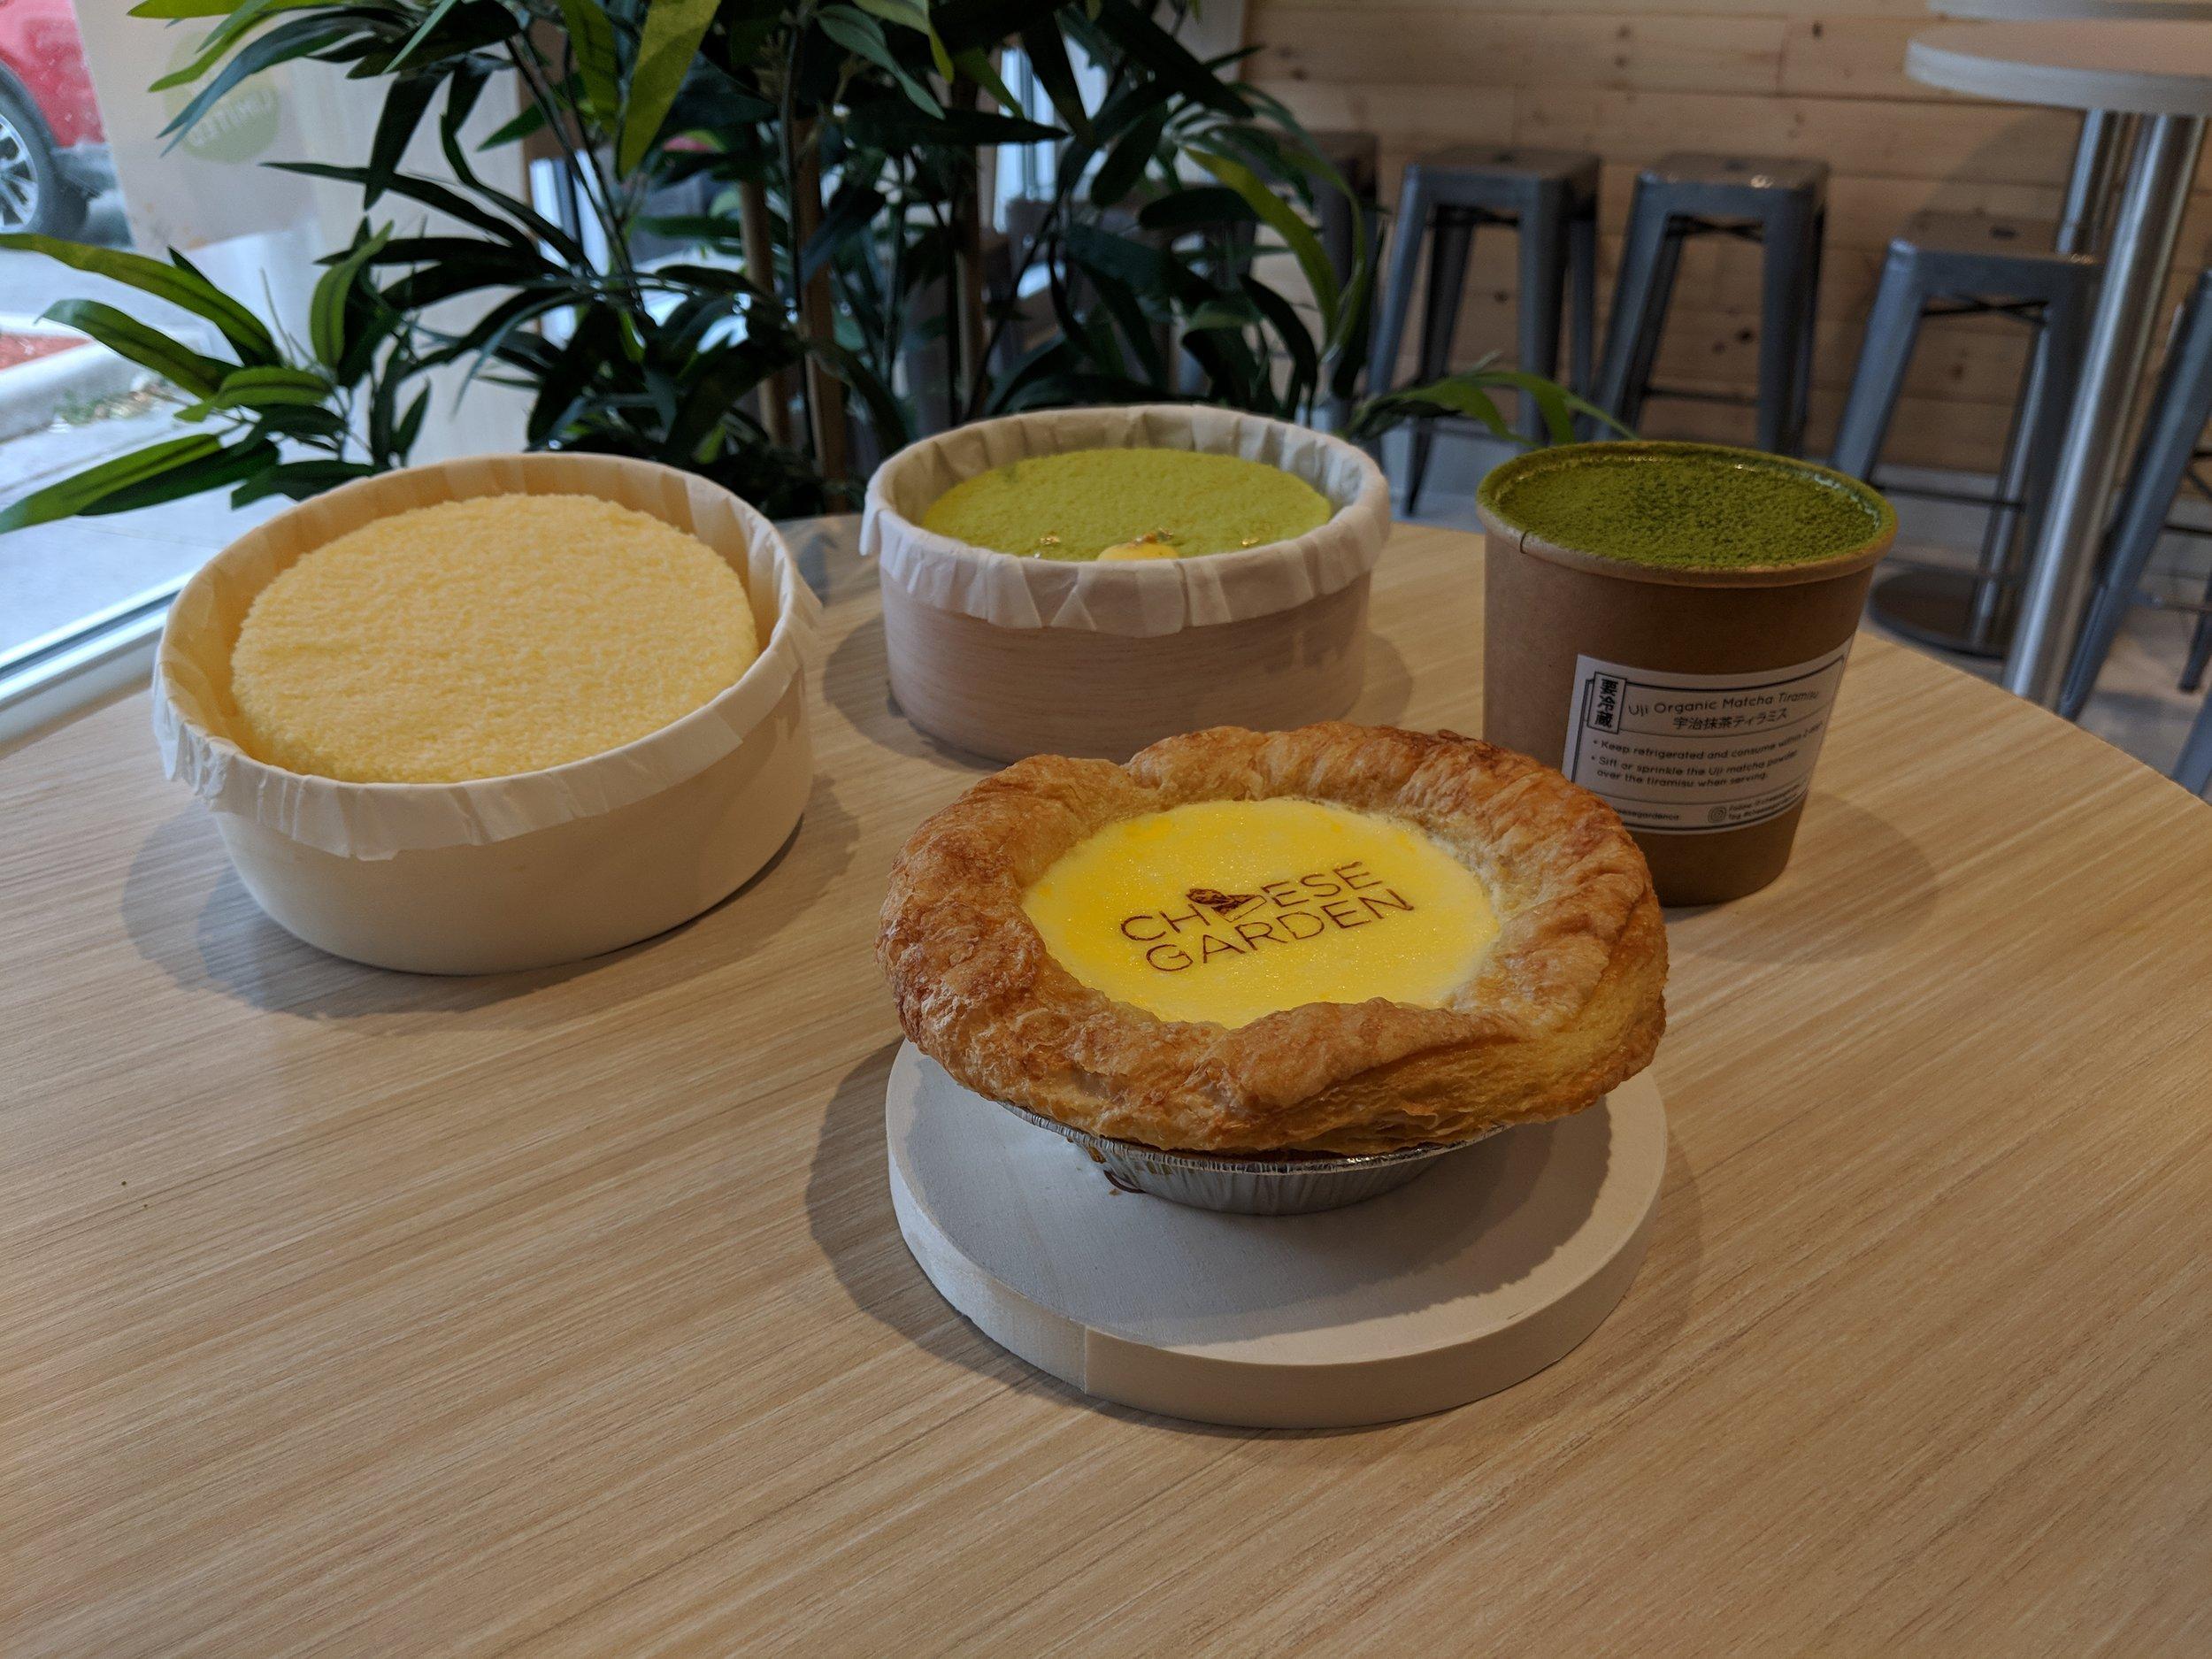 Original Double Fromage Cheesecake, Yuzu Pistachio Double Fromage Cheesecake, Uji Matcha Tiramisu, Baked Cheese Tart